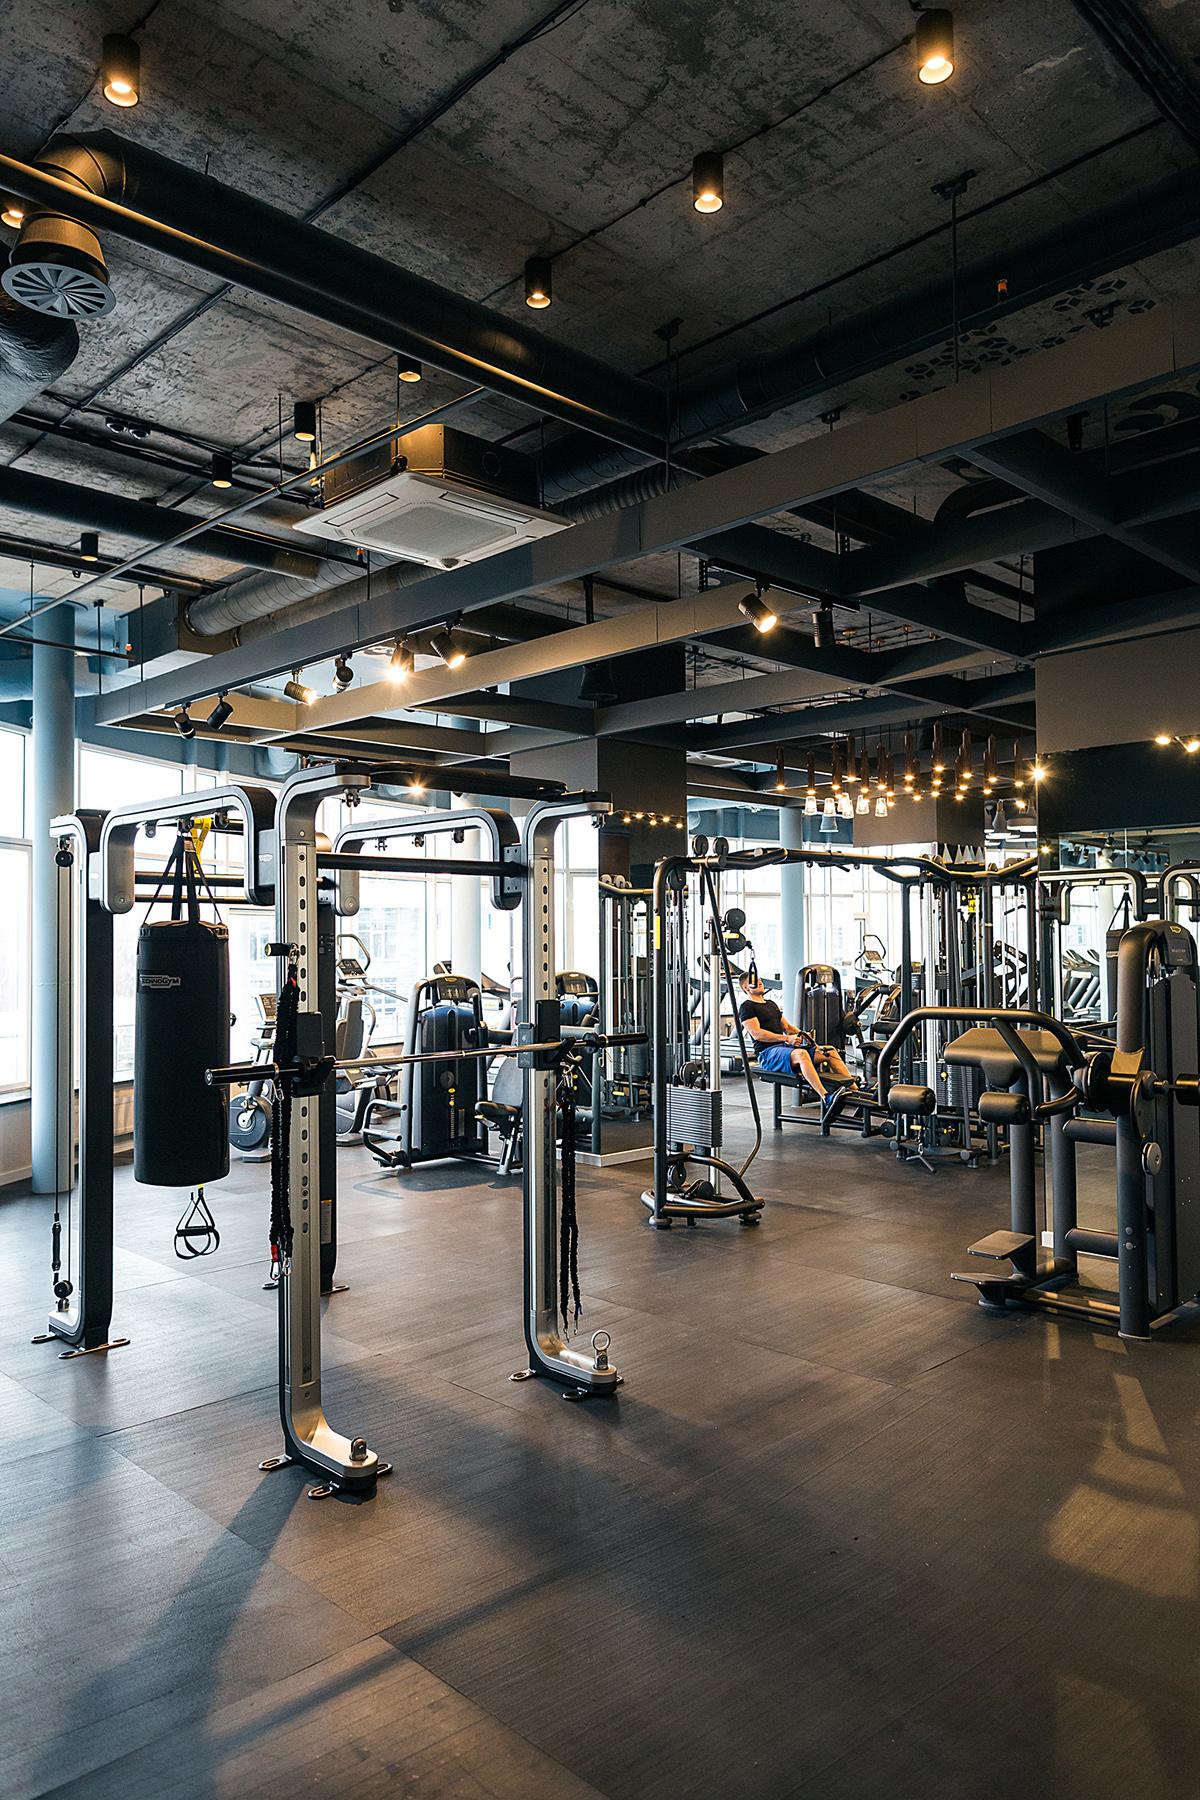 Fitness Club PALESTRA On Behance